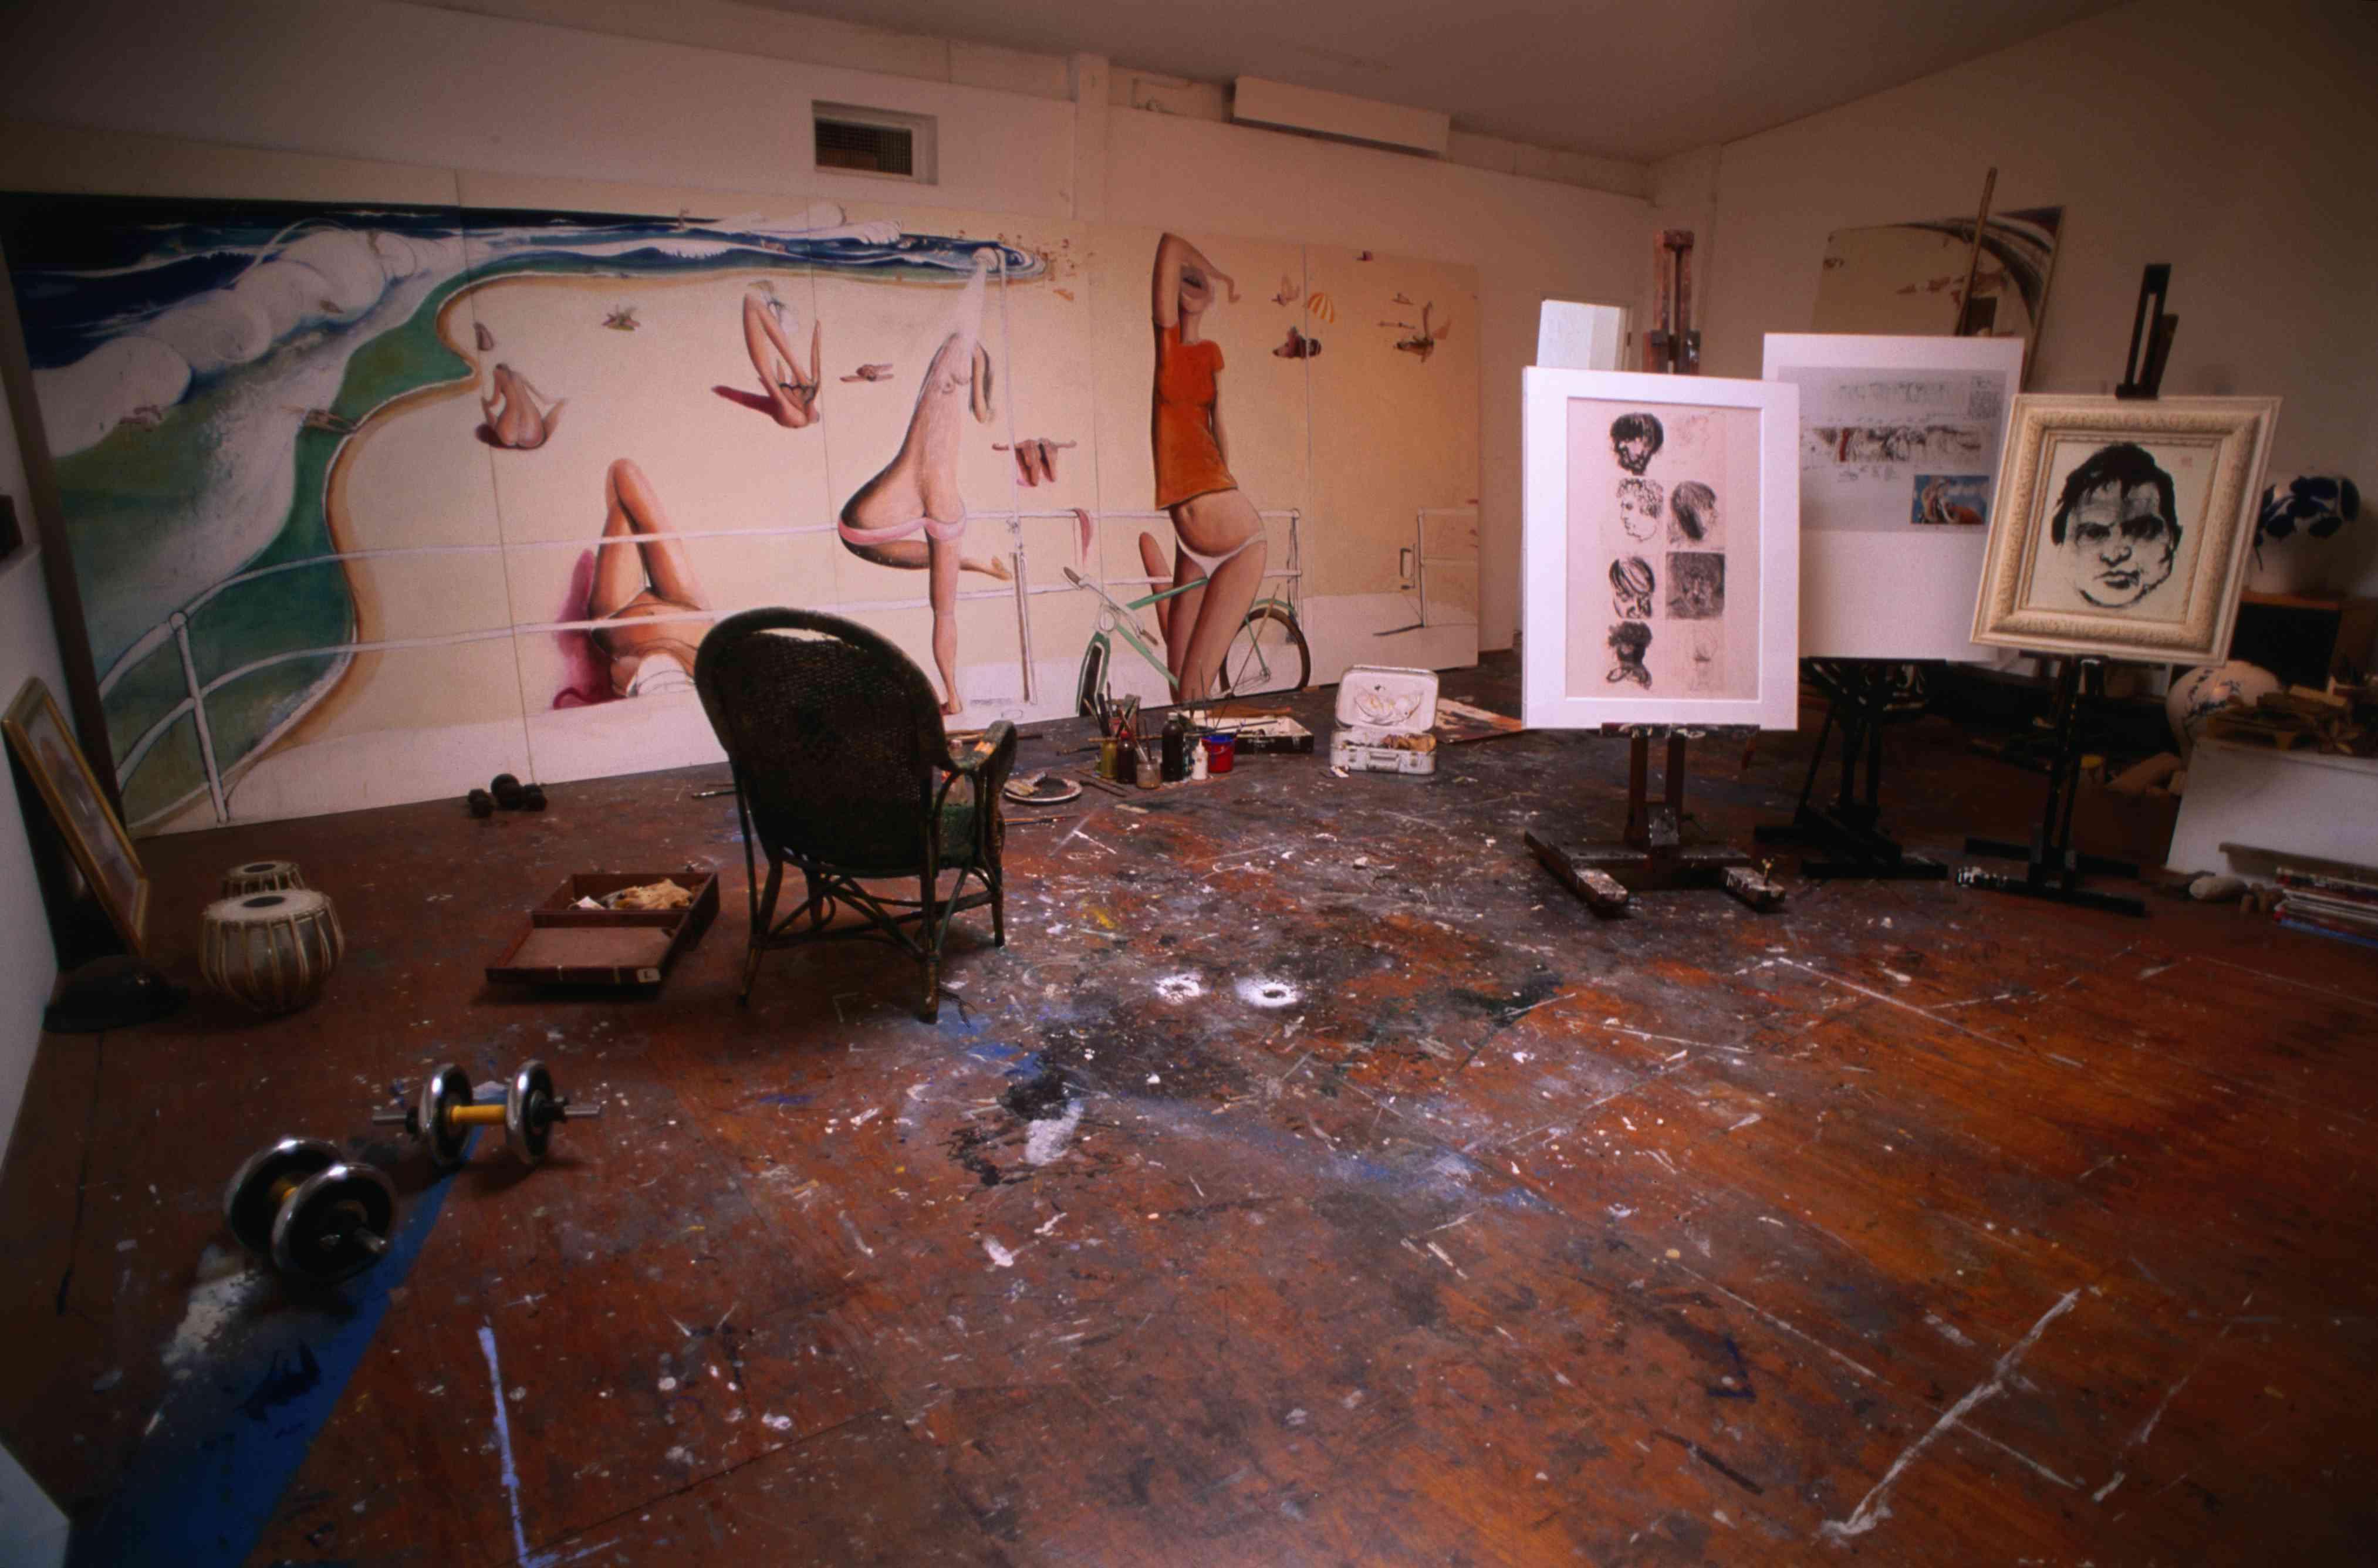 Art work in the studio of deceased artist, Brett Whiteley, now part of a public gallery